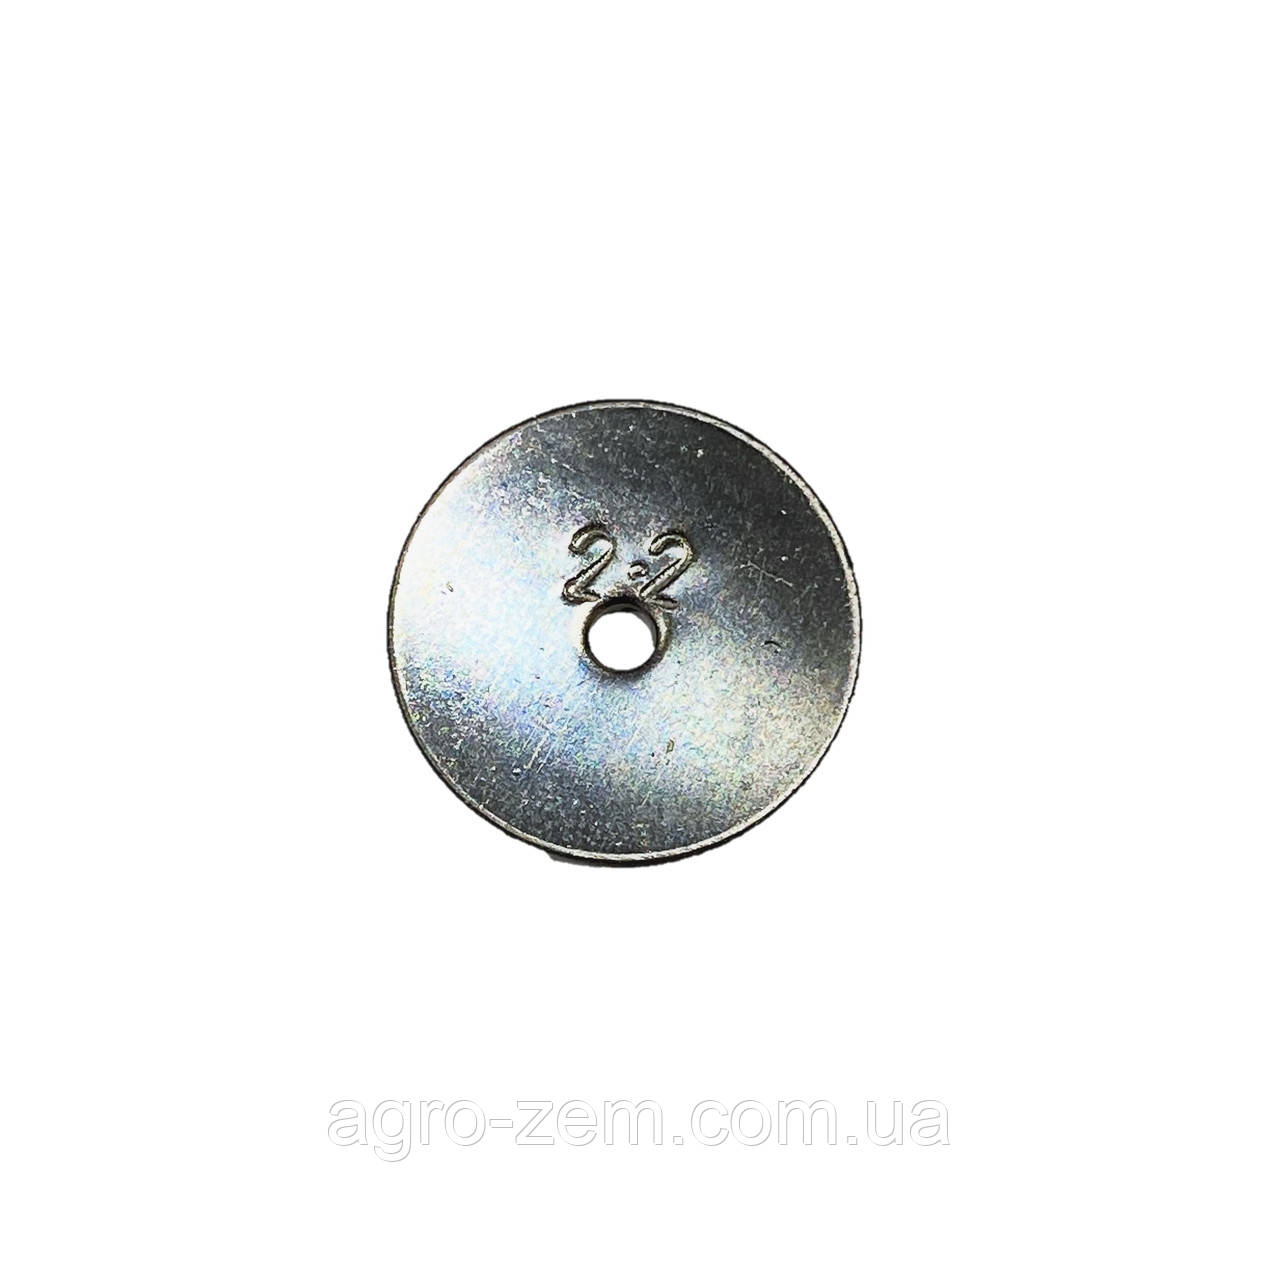 Дозатор КАС 2.2 мм Agroplast AP12.6_22 |225481|